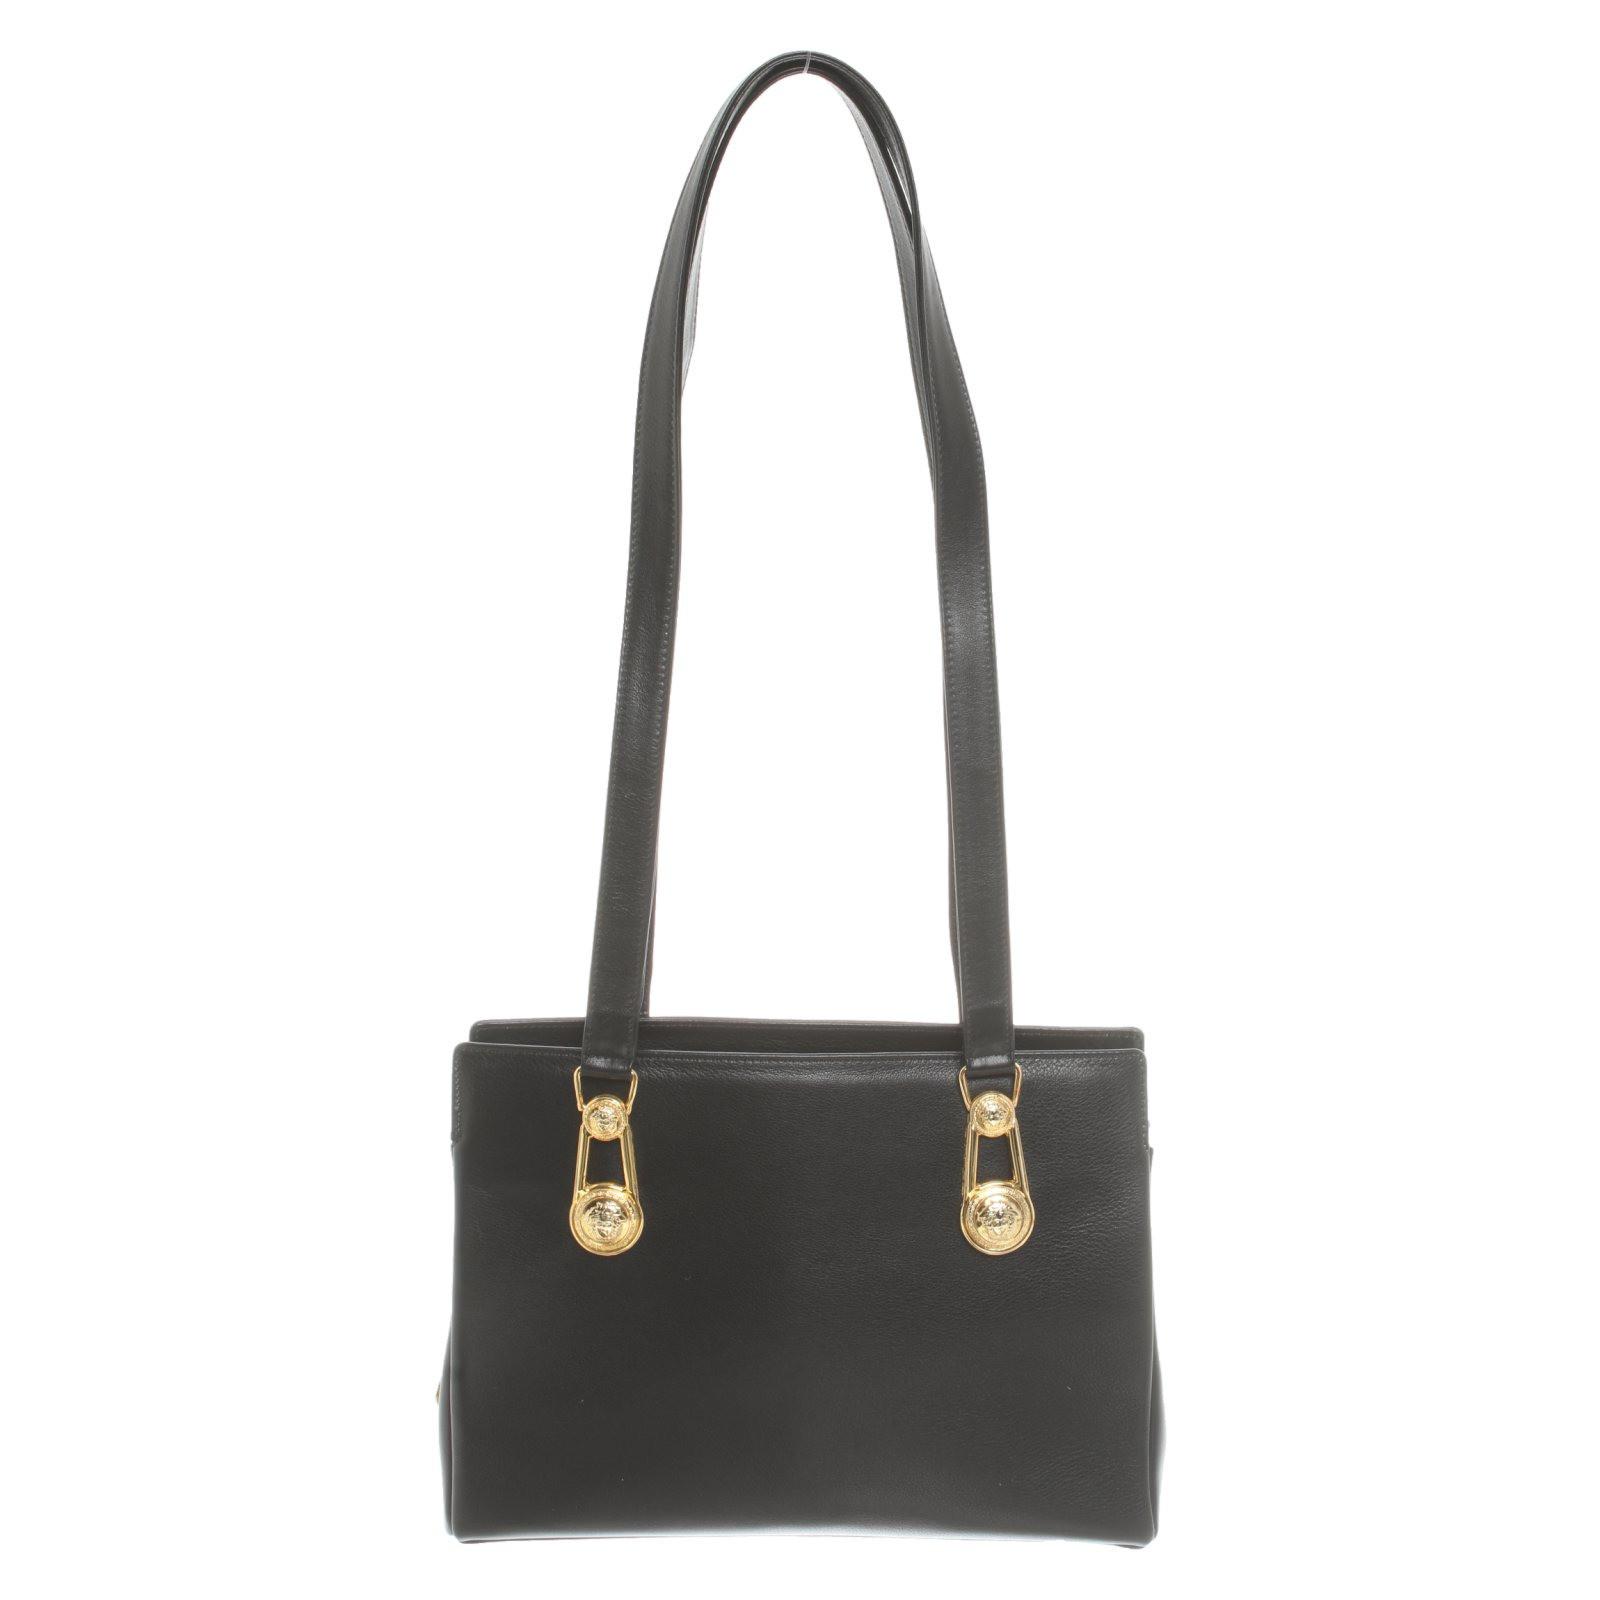 Gianni Versace Handbag Leather in Black